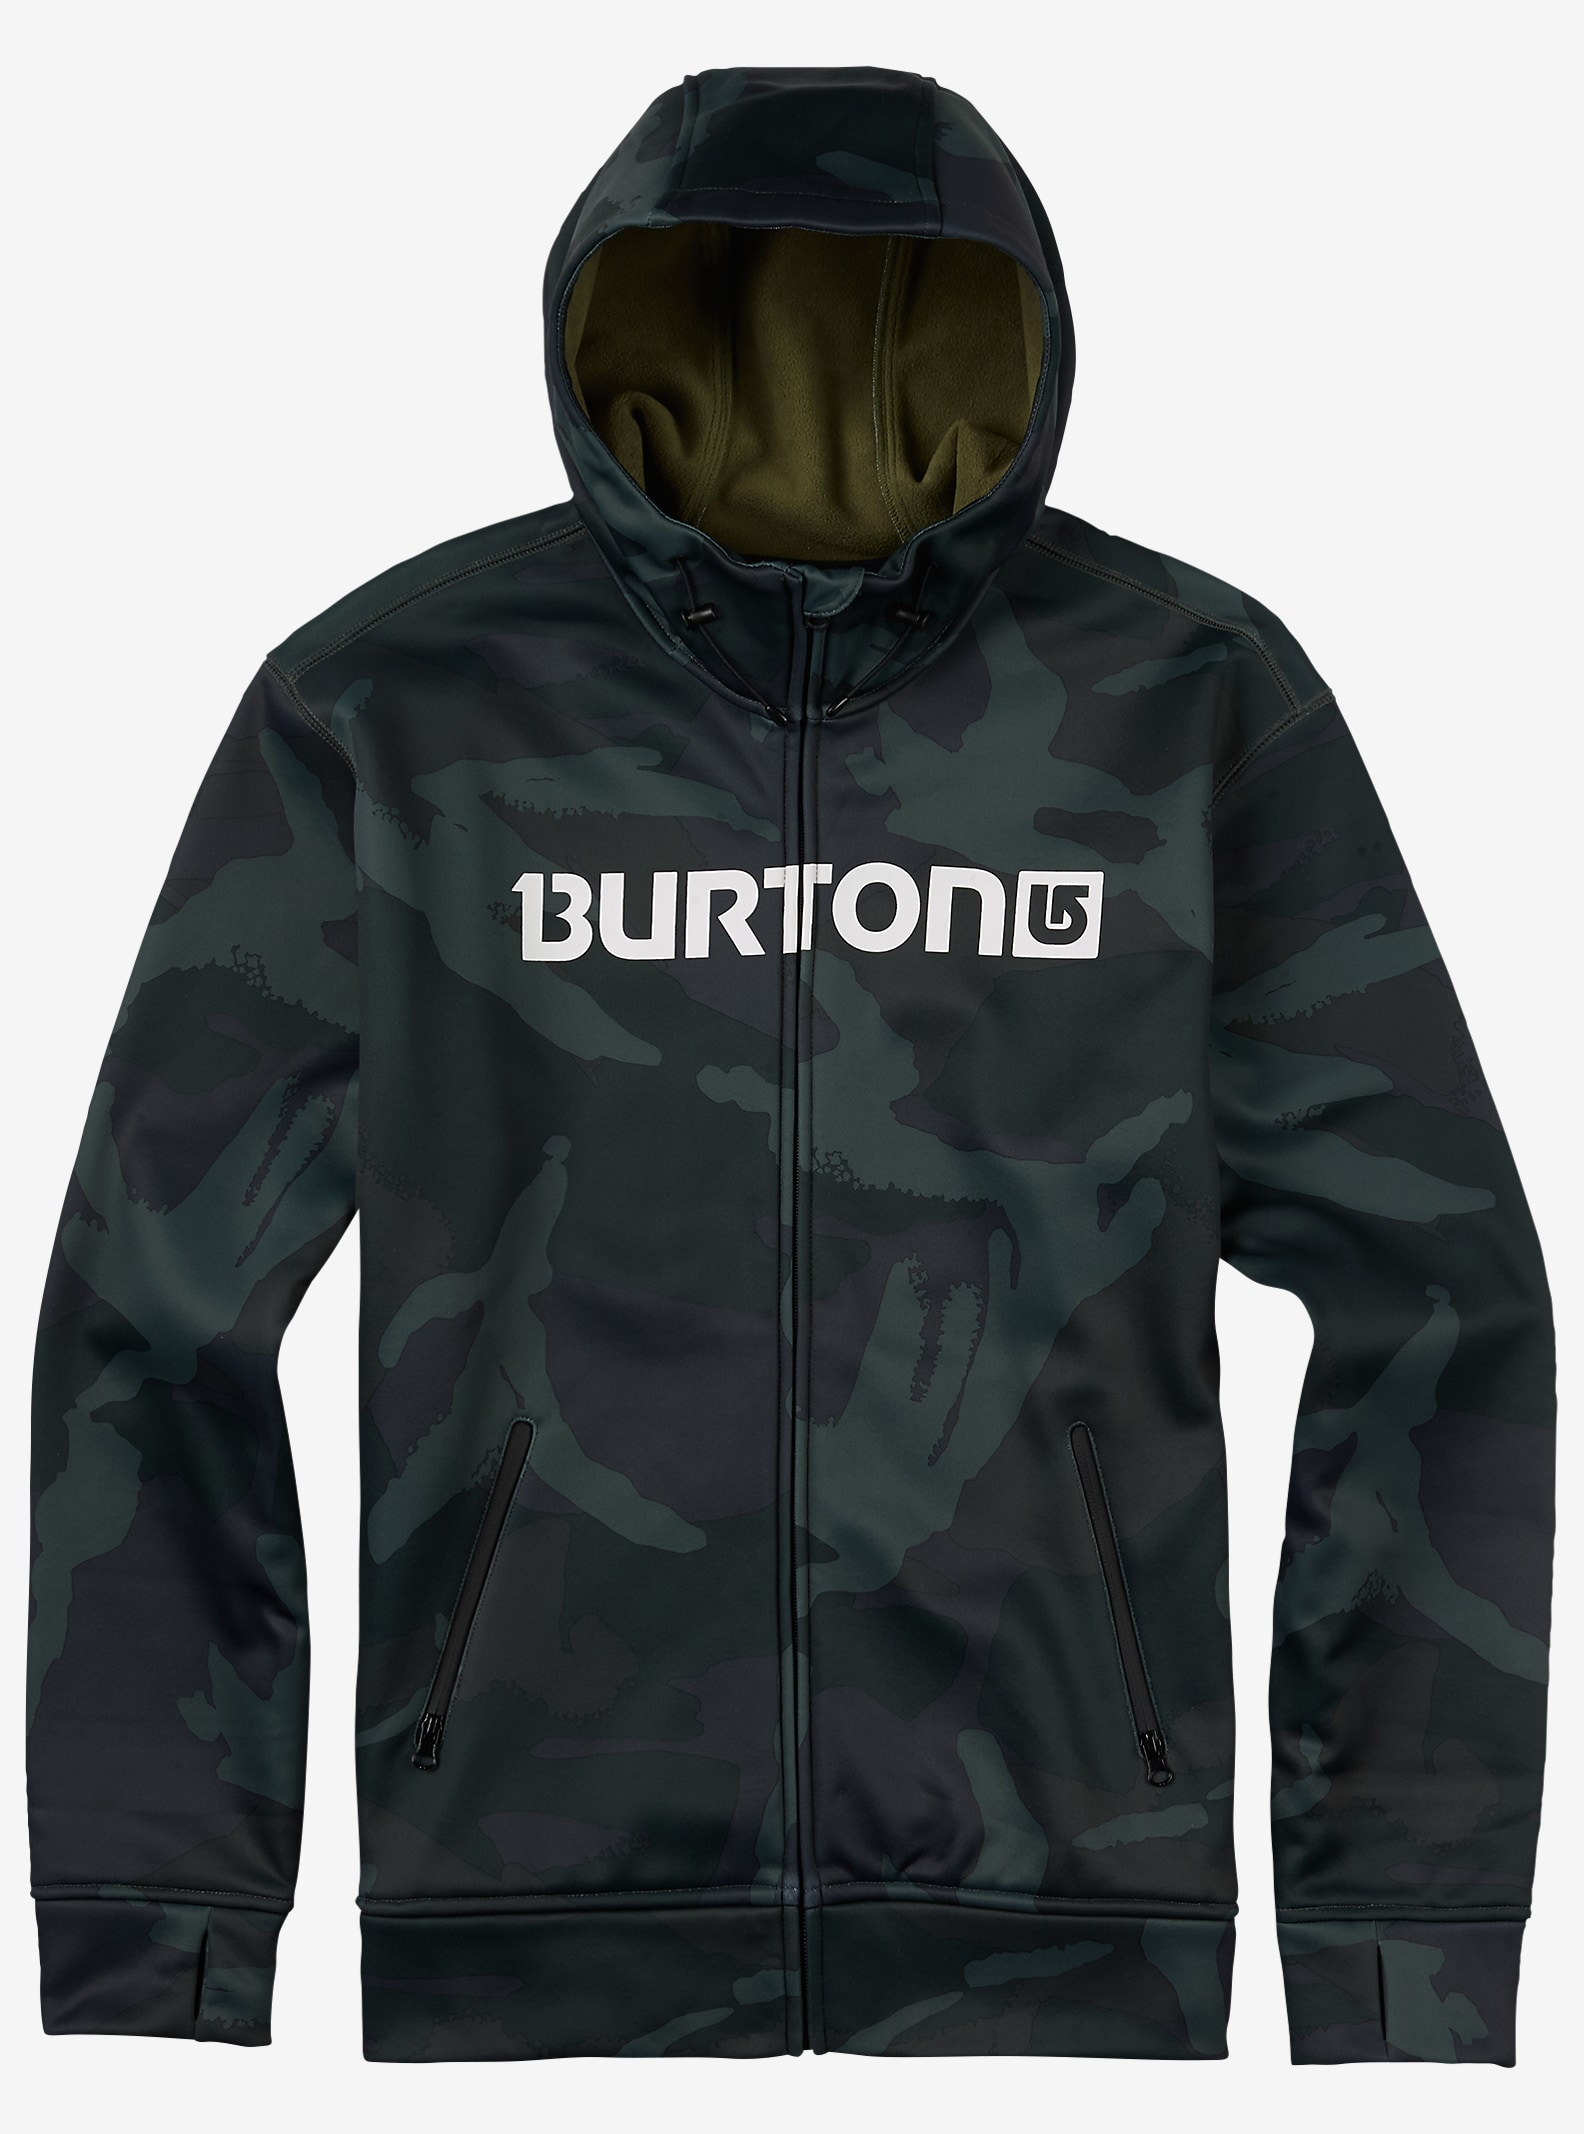 Burton Bonded Full-Zip Hoodie shown in Beetle Derby Camo